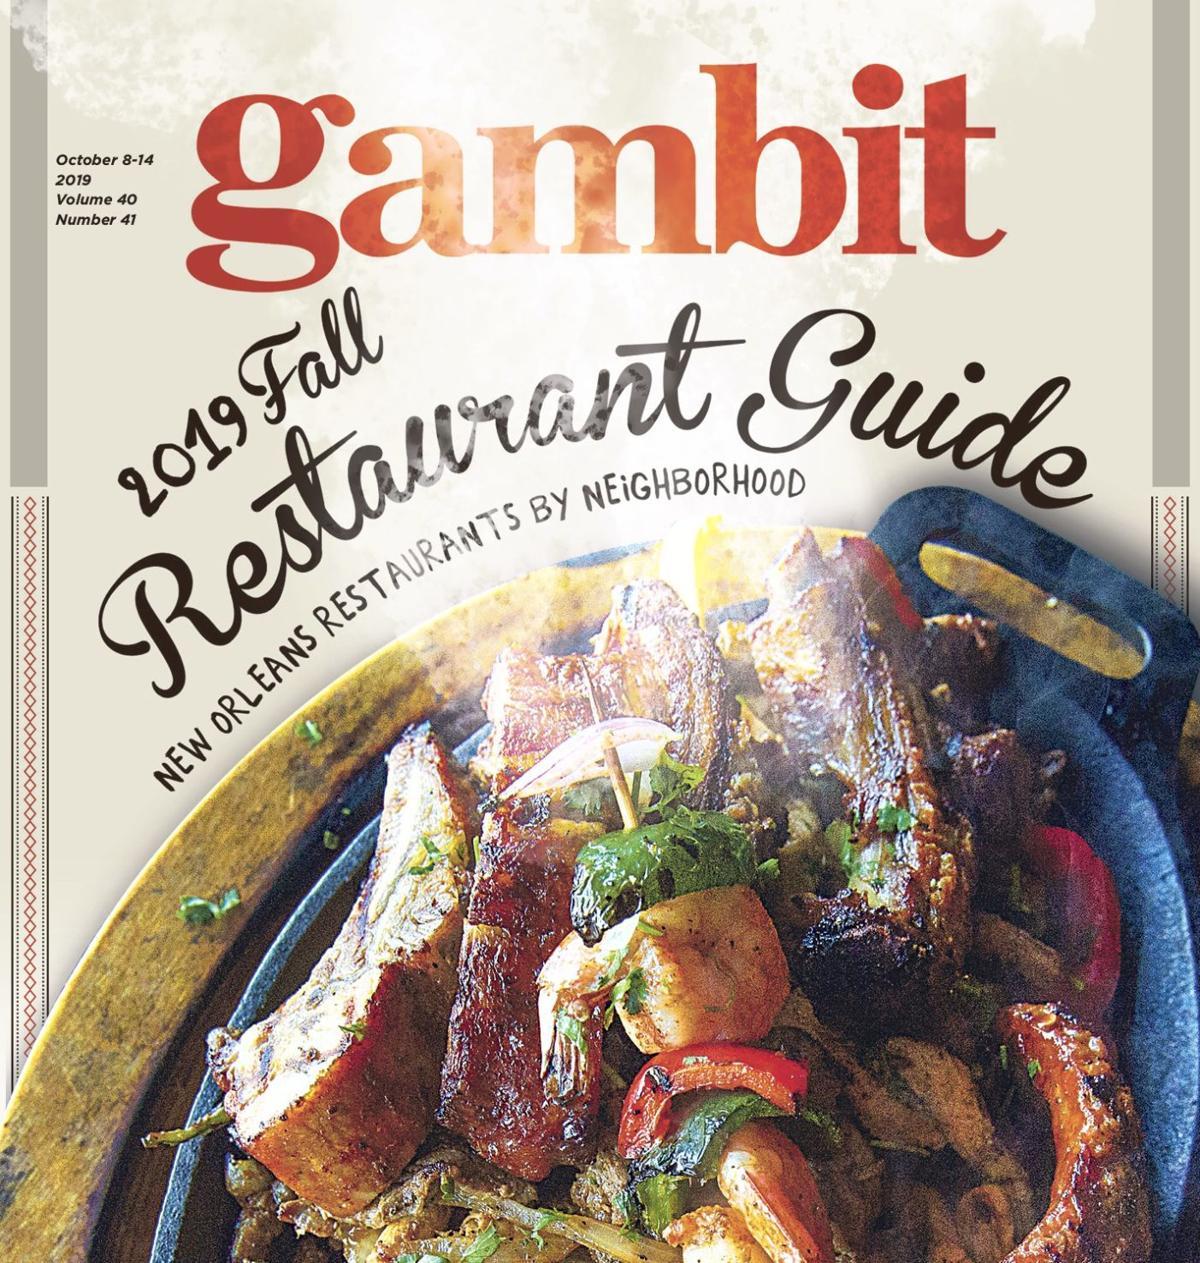 gambit restaurant guide cover